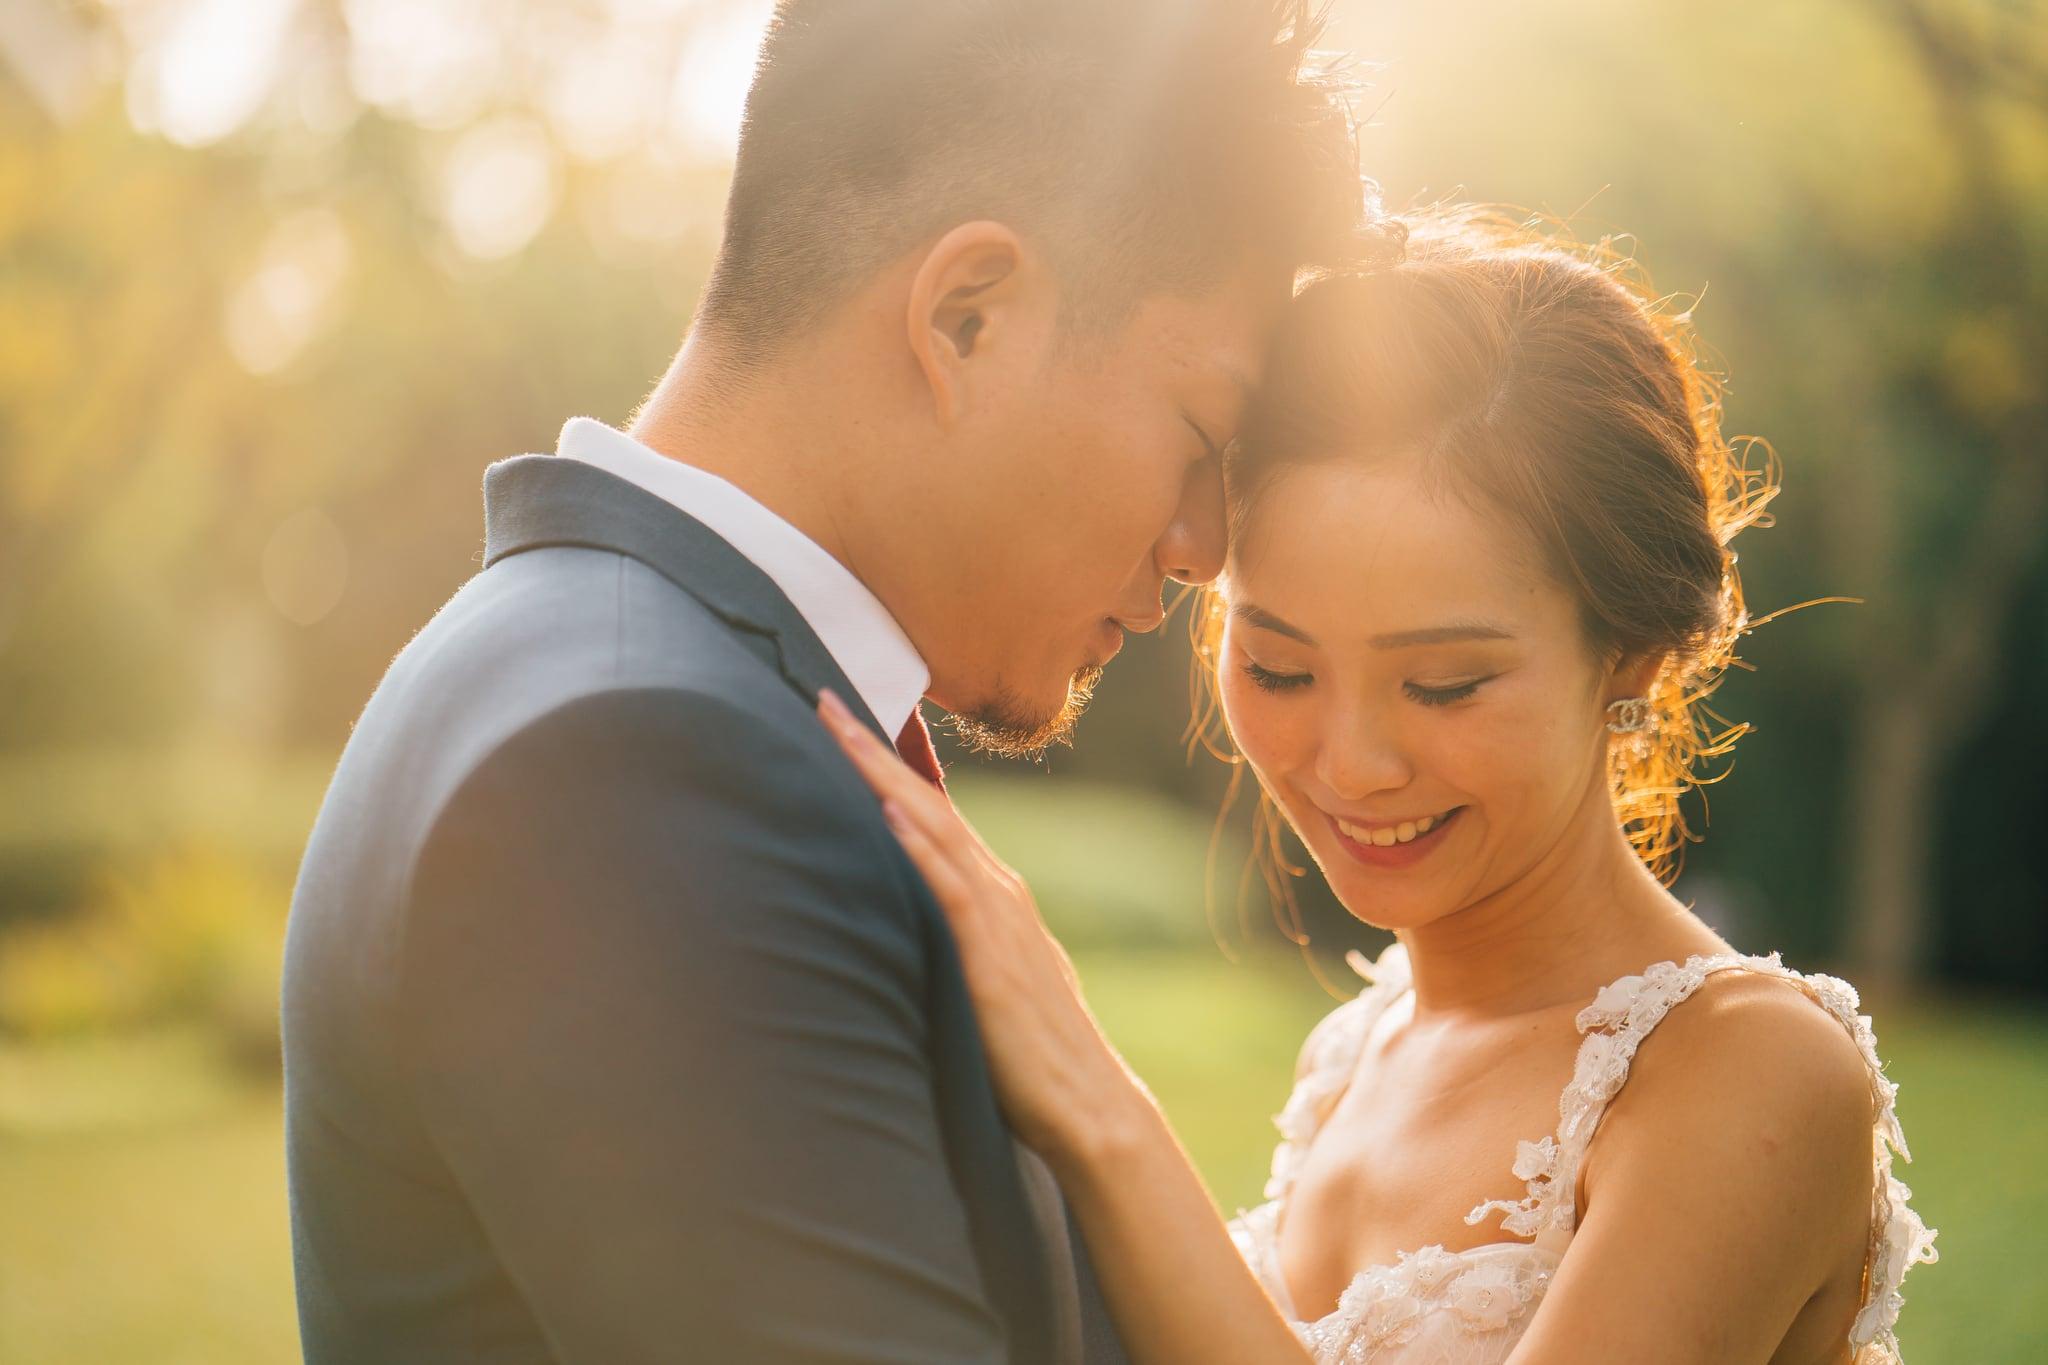 Sweet deal! - Enjoy SGD300 off Your Wedding Shoot!